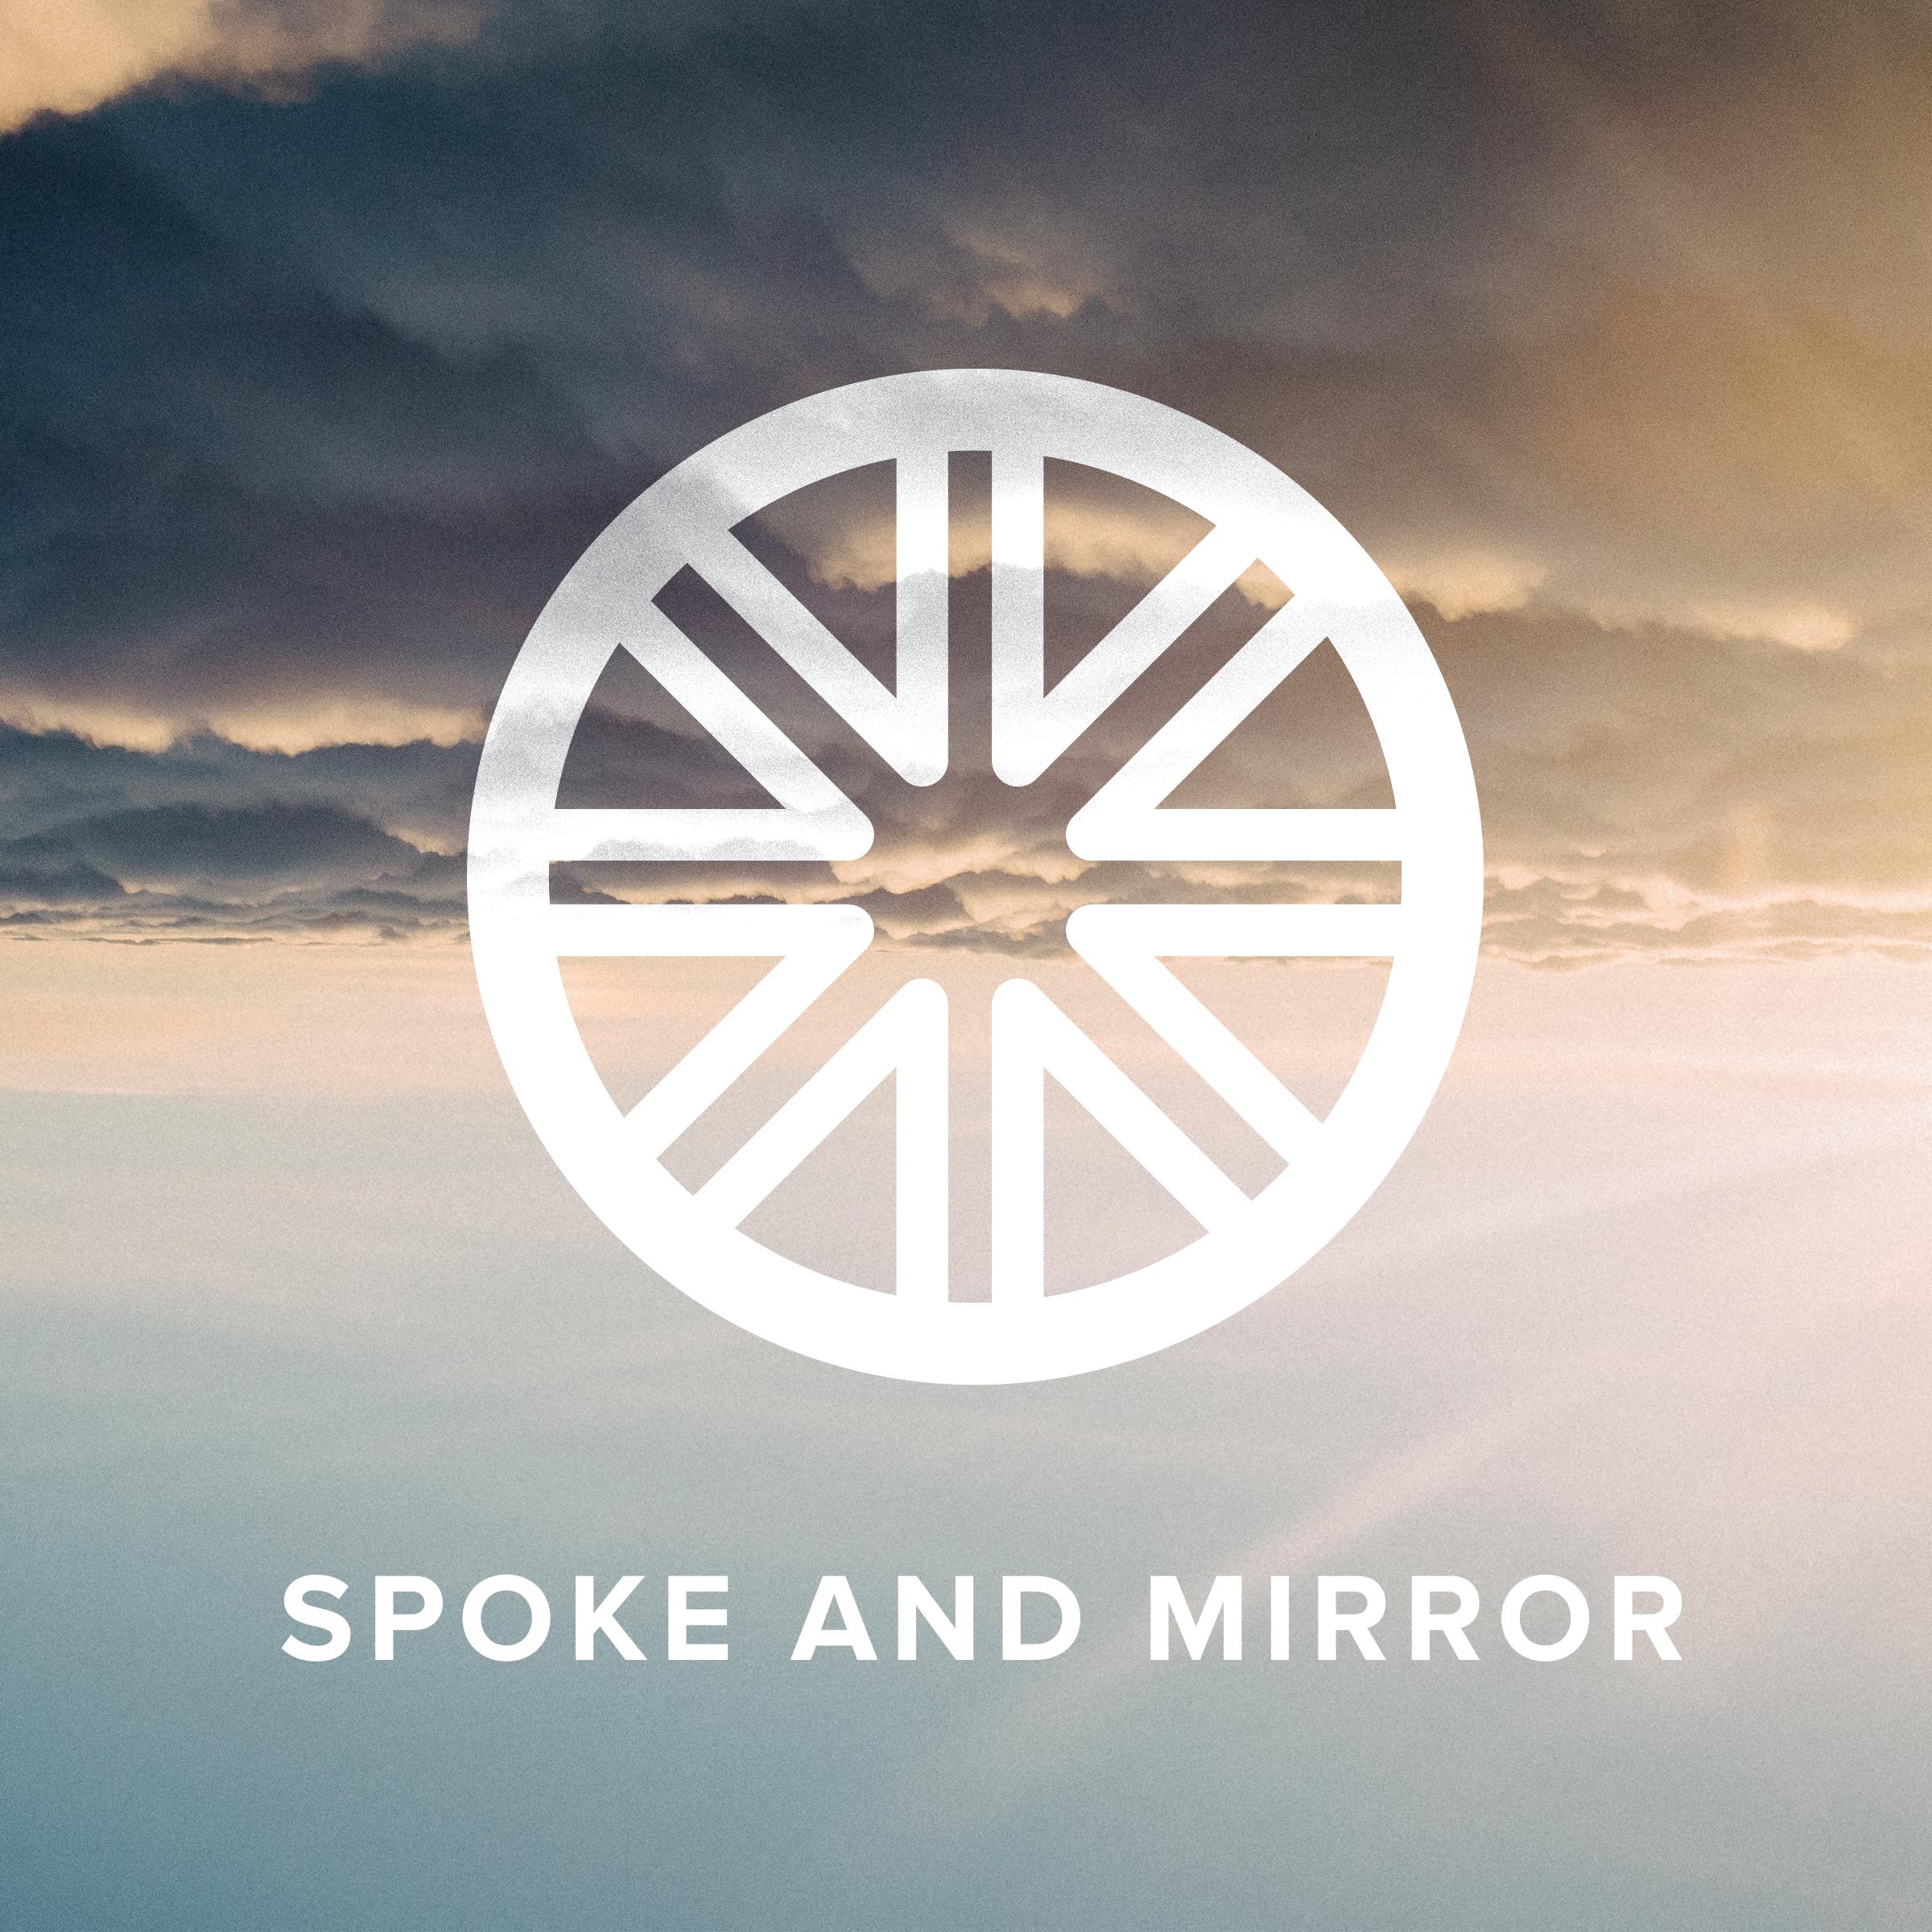 Spoke And Mirror Wheel